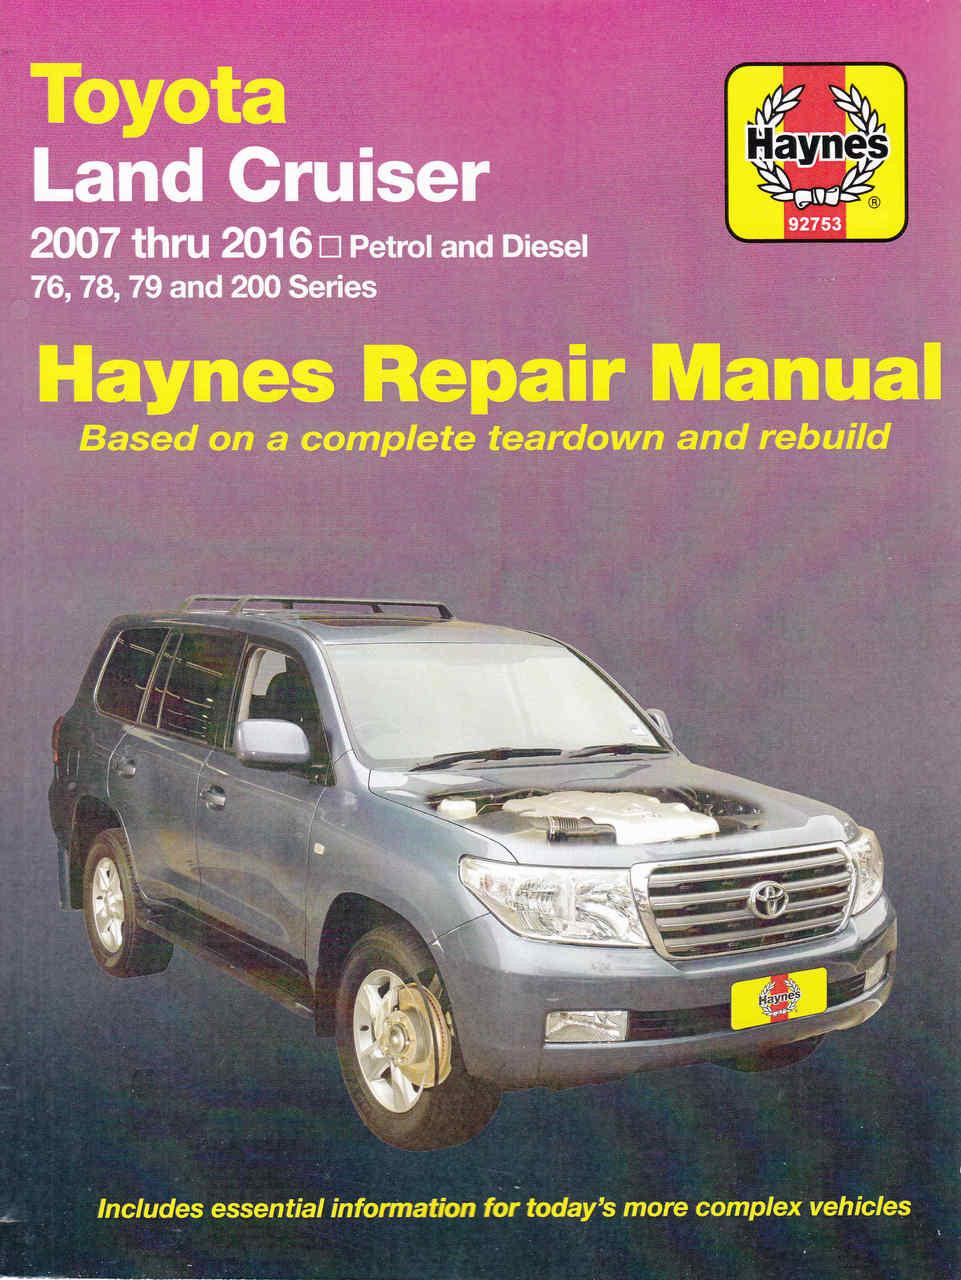 Contec cms 5100 service manual